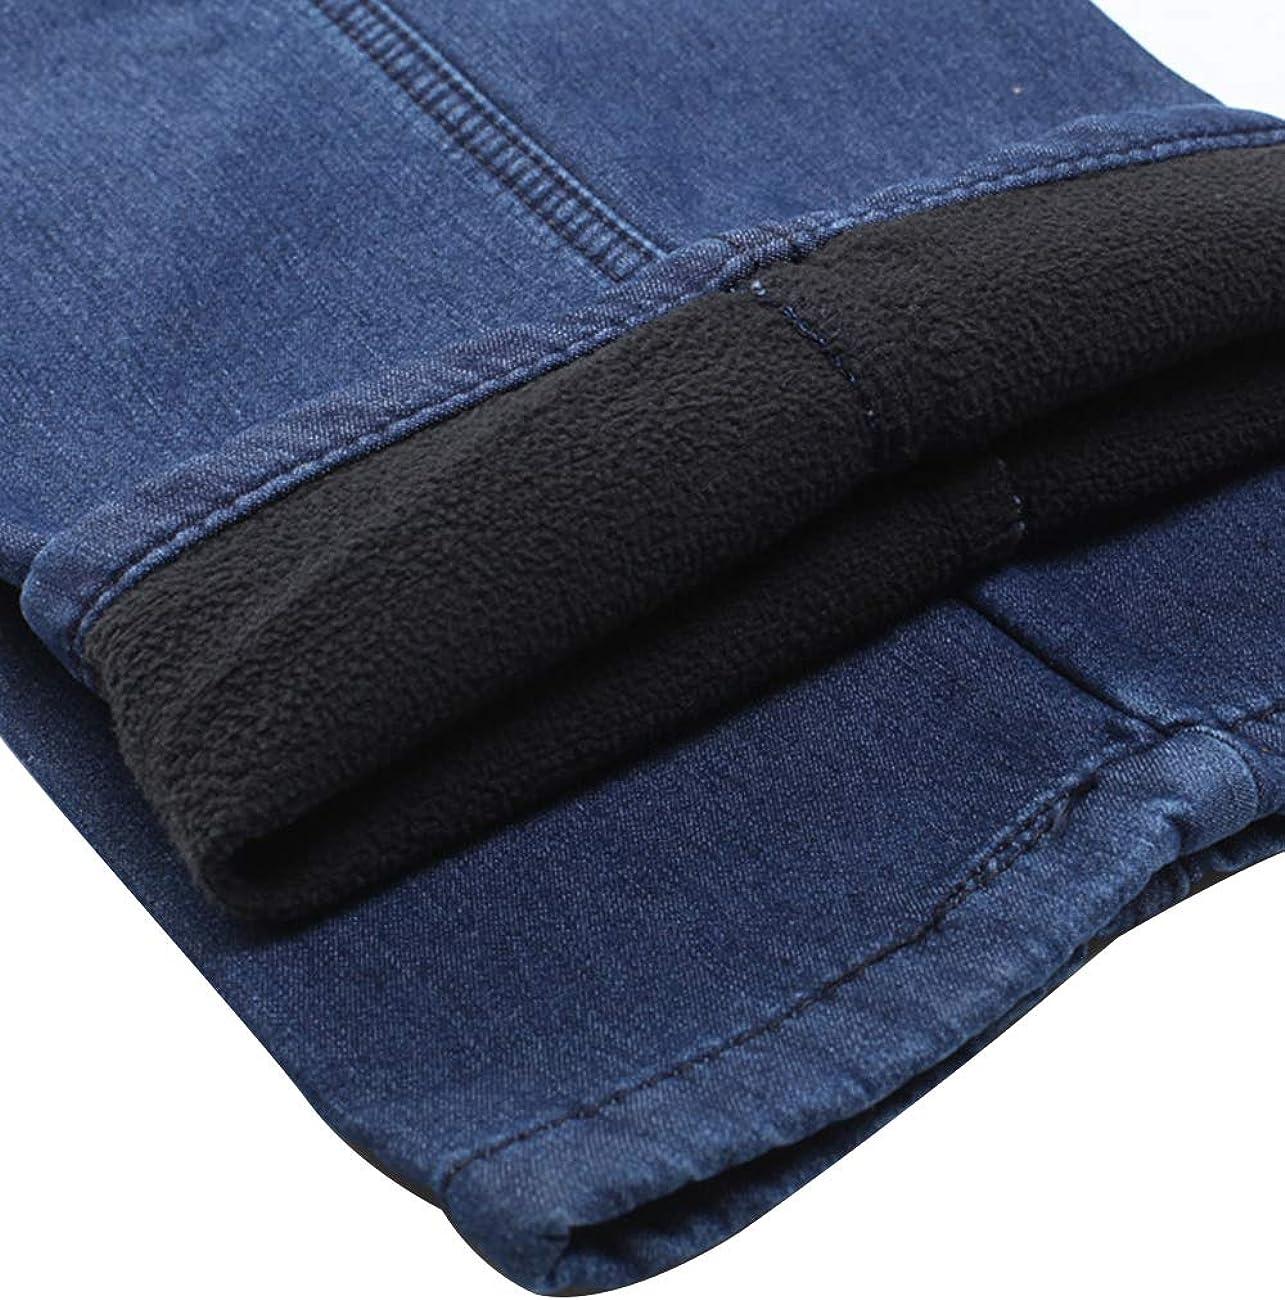 Zoulee Men's Full Elastic Waist Denim Pull On Jeans Straight Trousers Pants